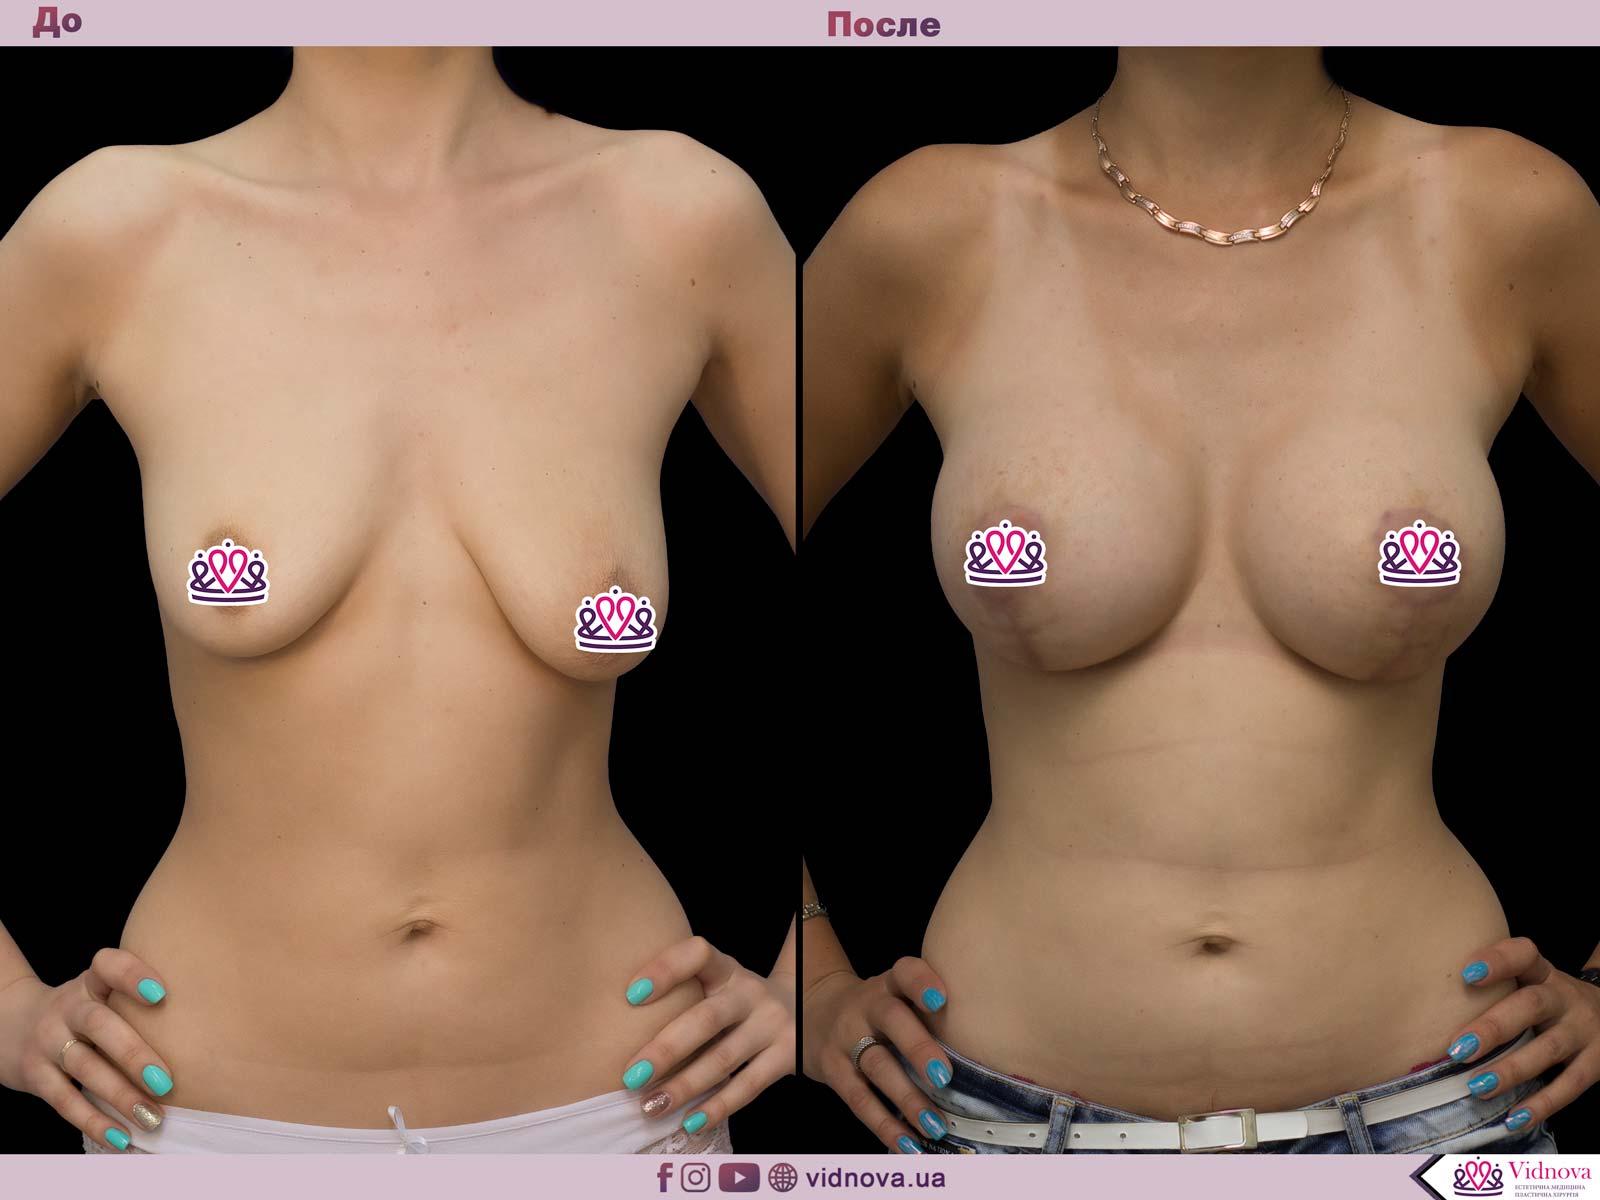 Коррекция асимметрии груди 1 91